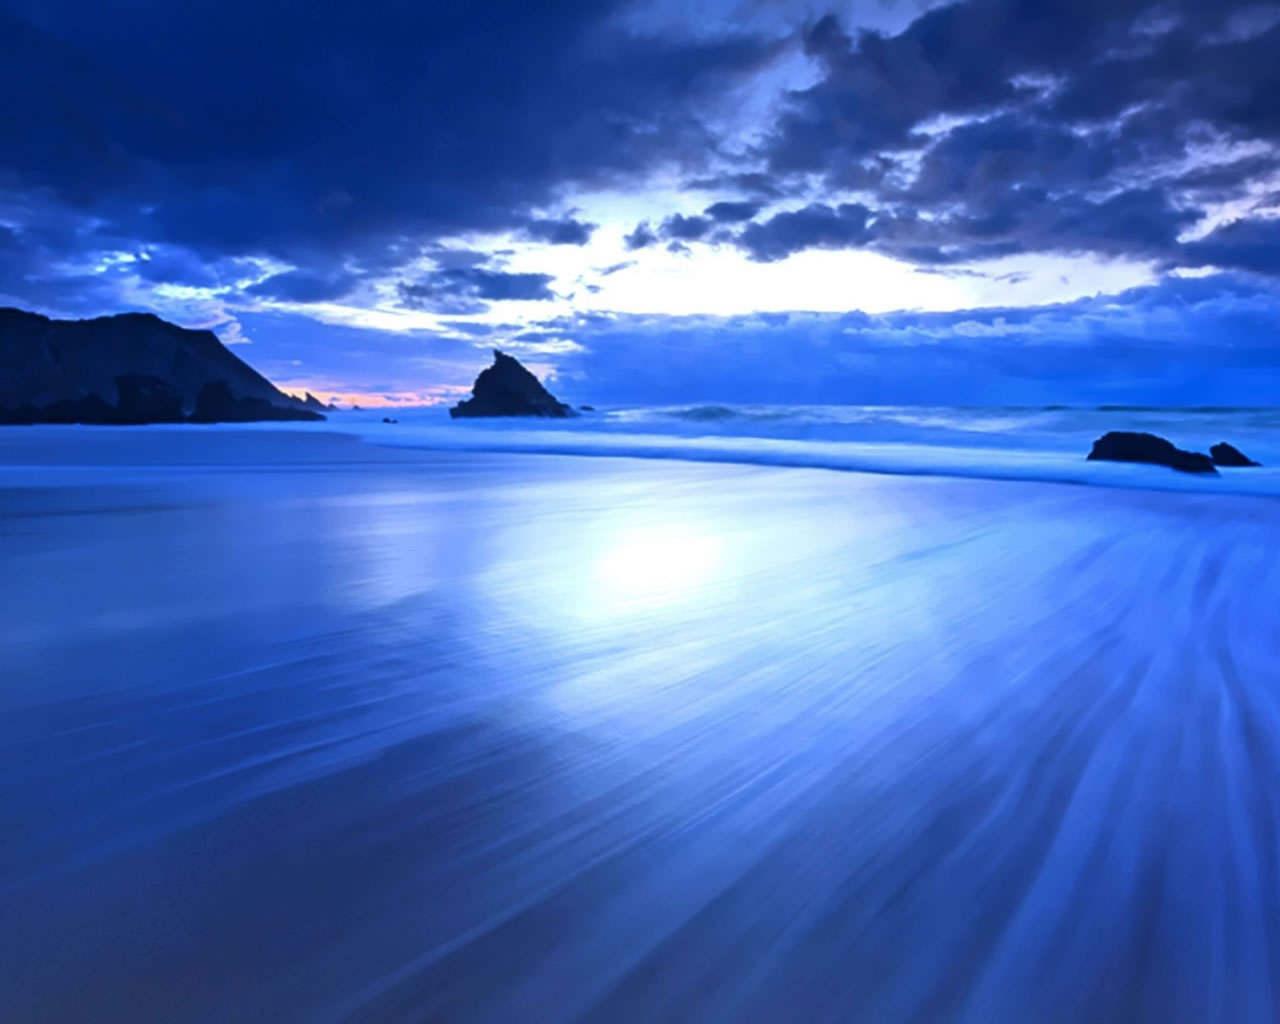 Free Images 4k Wallpaper Beach Calm Cliff Clouds Hd: Ocean Scene Wallpaper